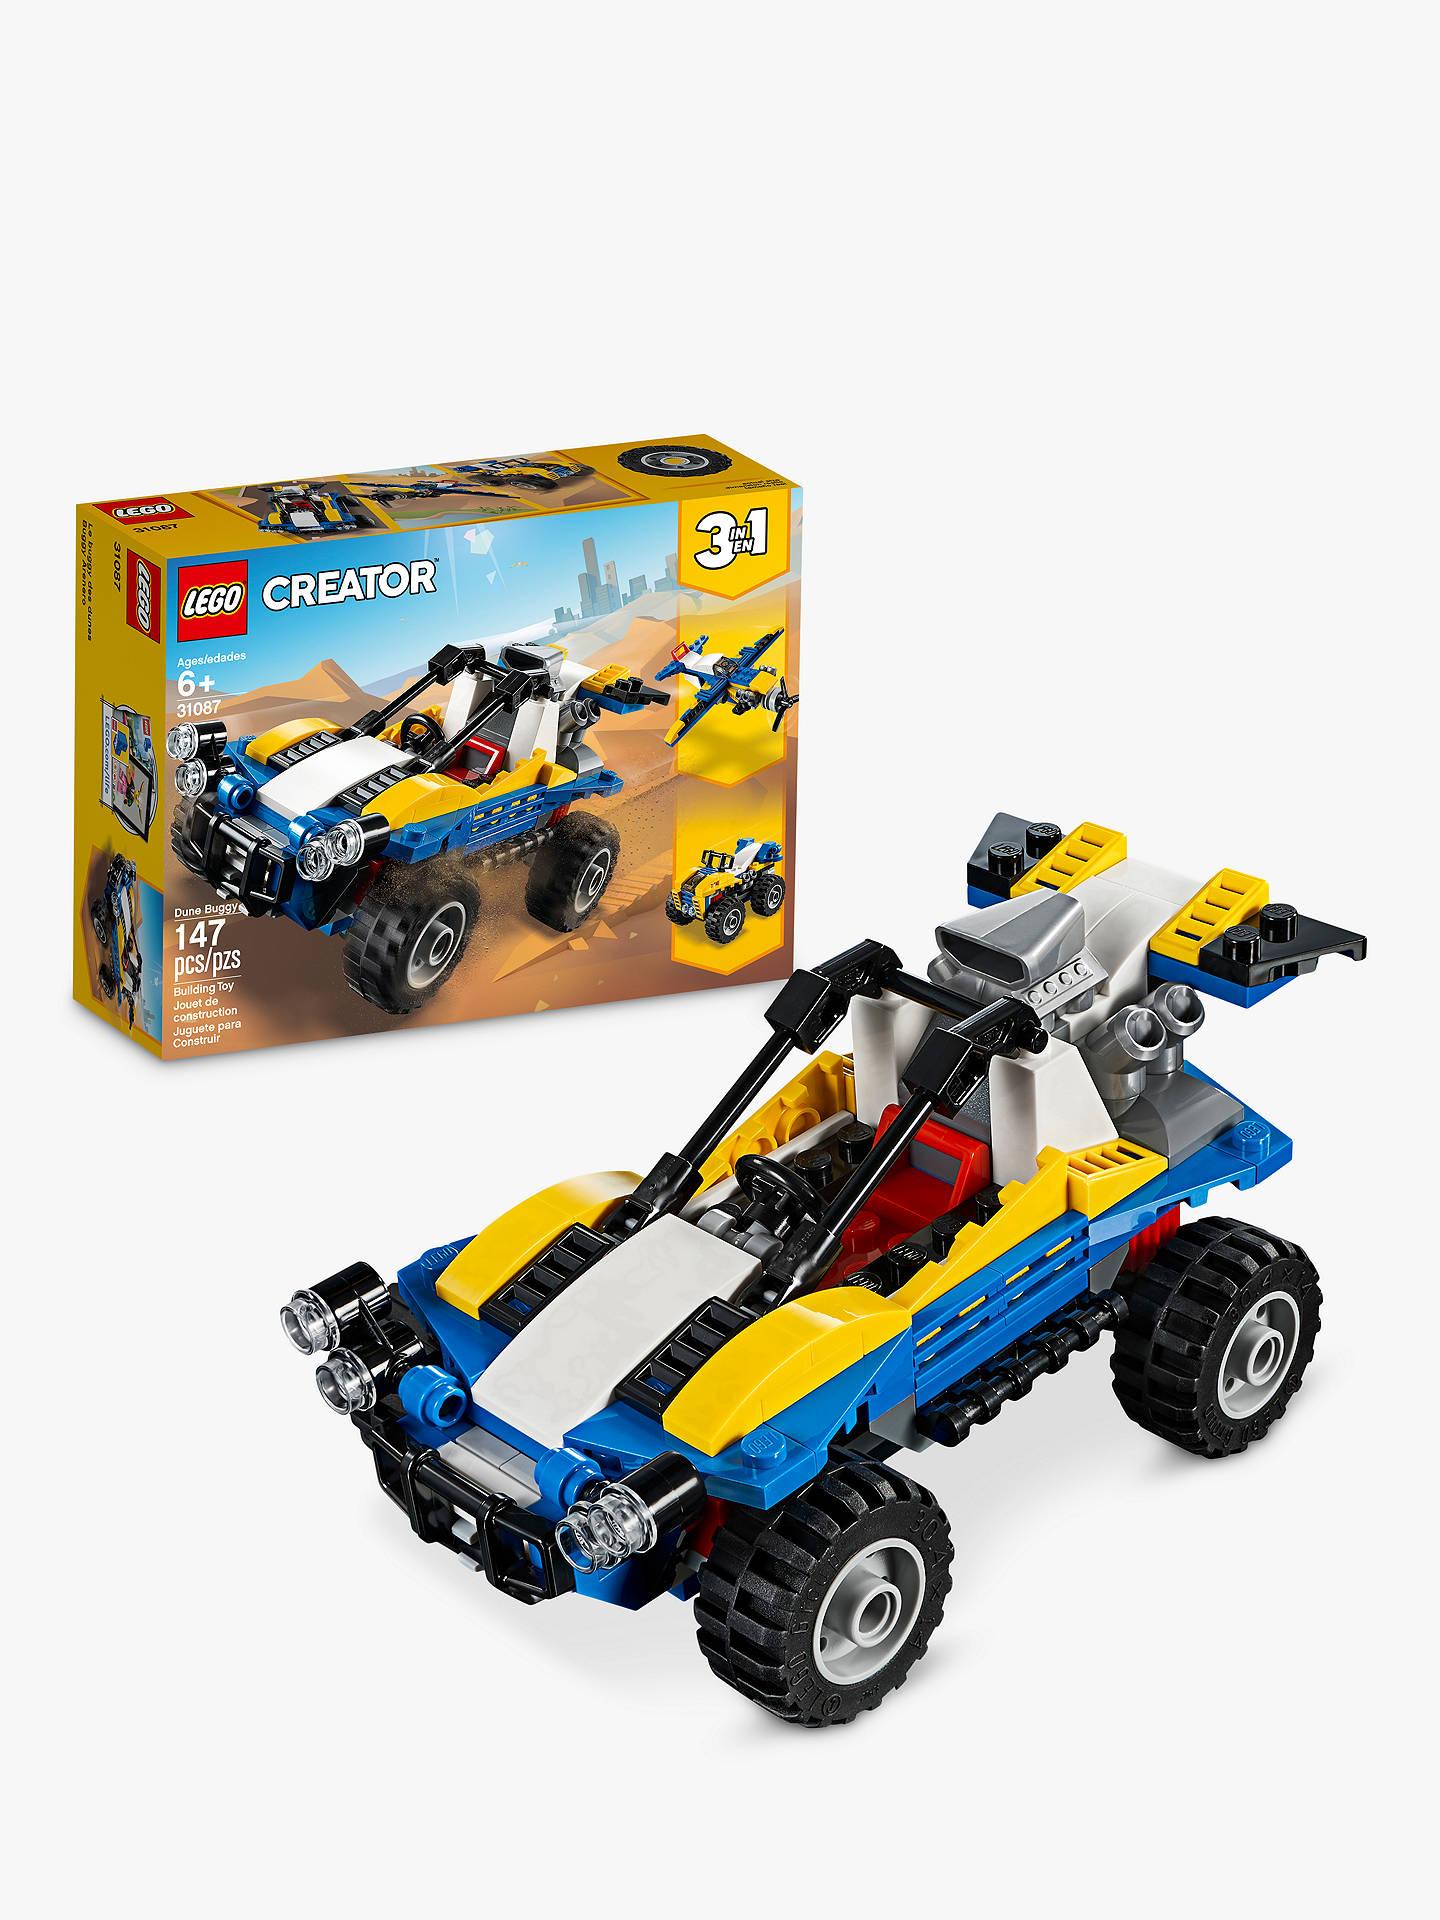 LEGO Creator 31087 3 in 1 Dune Buggy